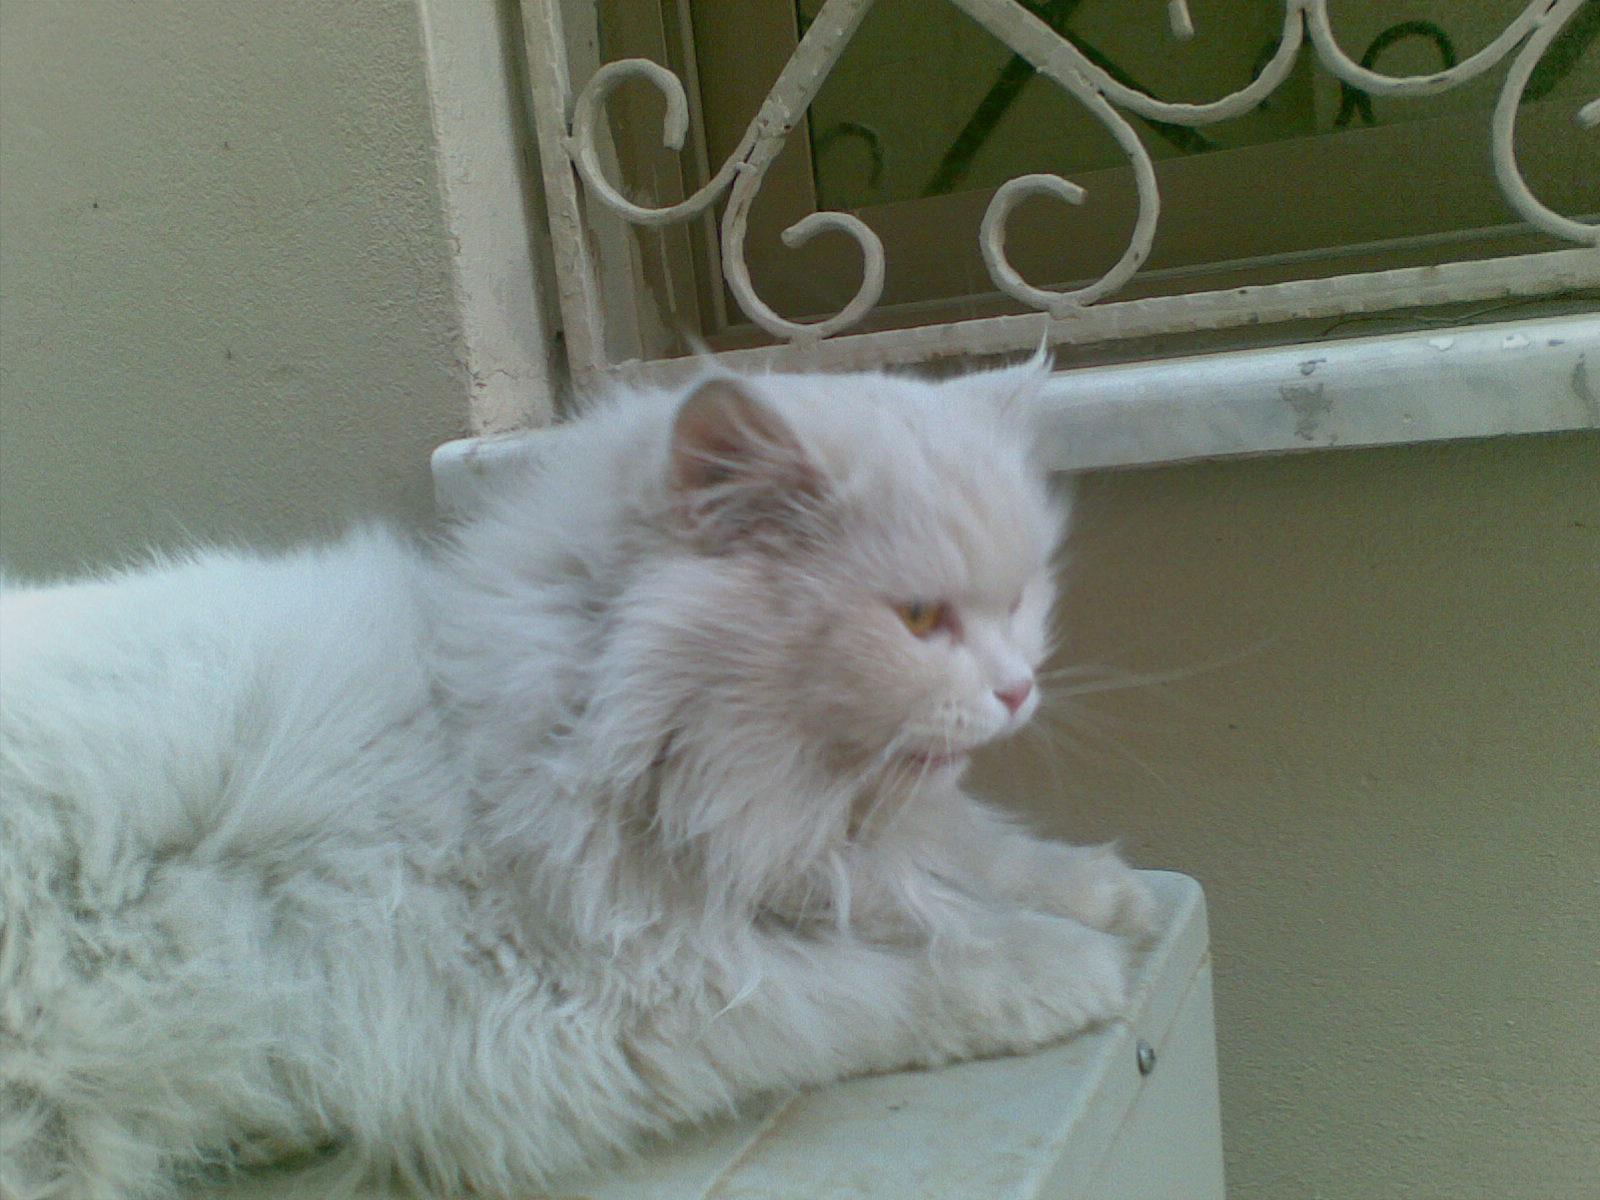 yang lucu karena selain ia cerdas kucing juga sangat lucu dan cantik